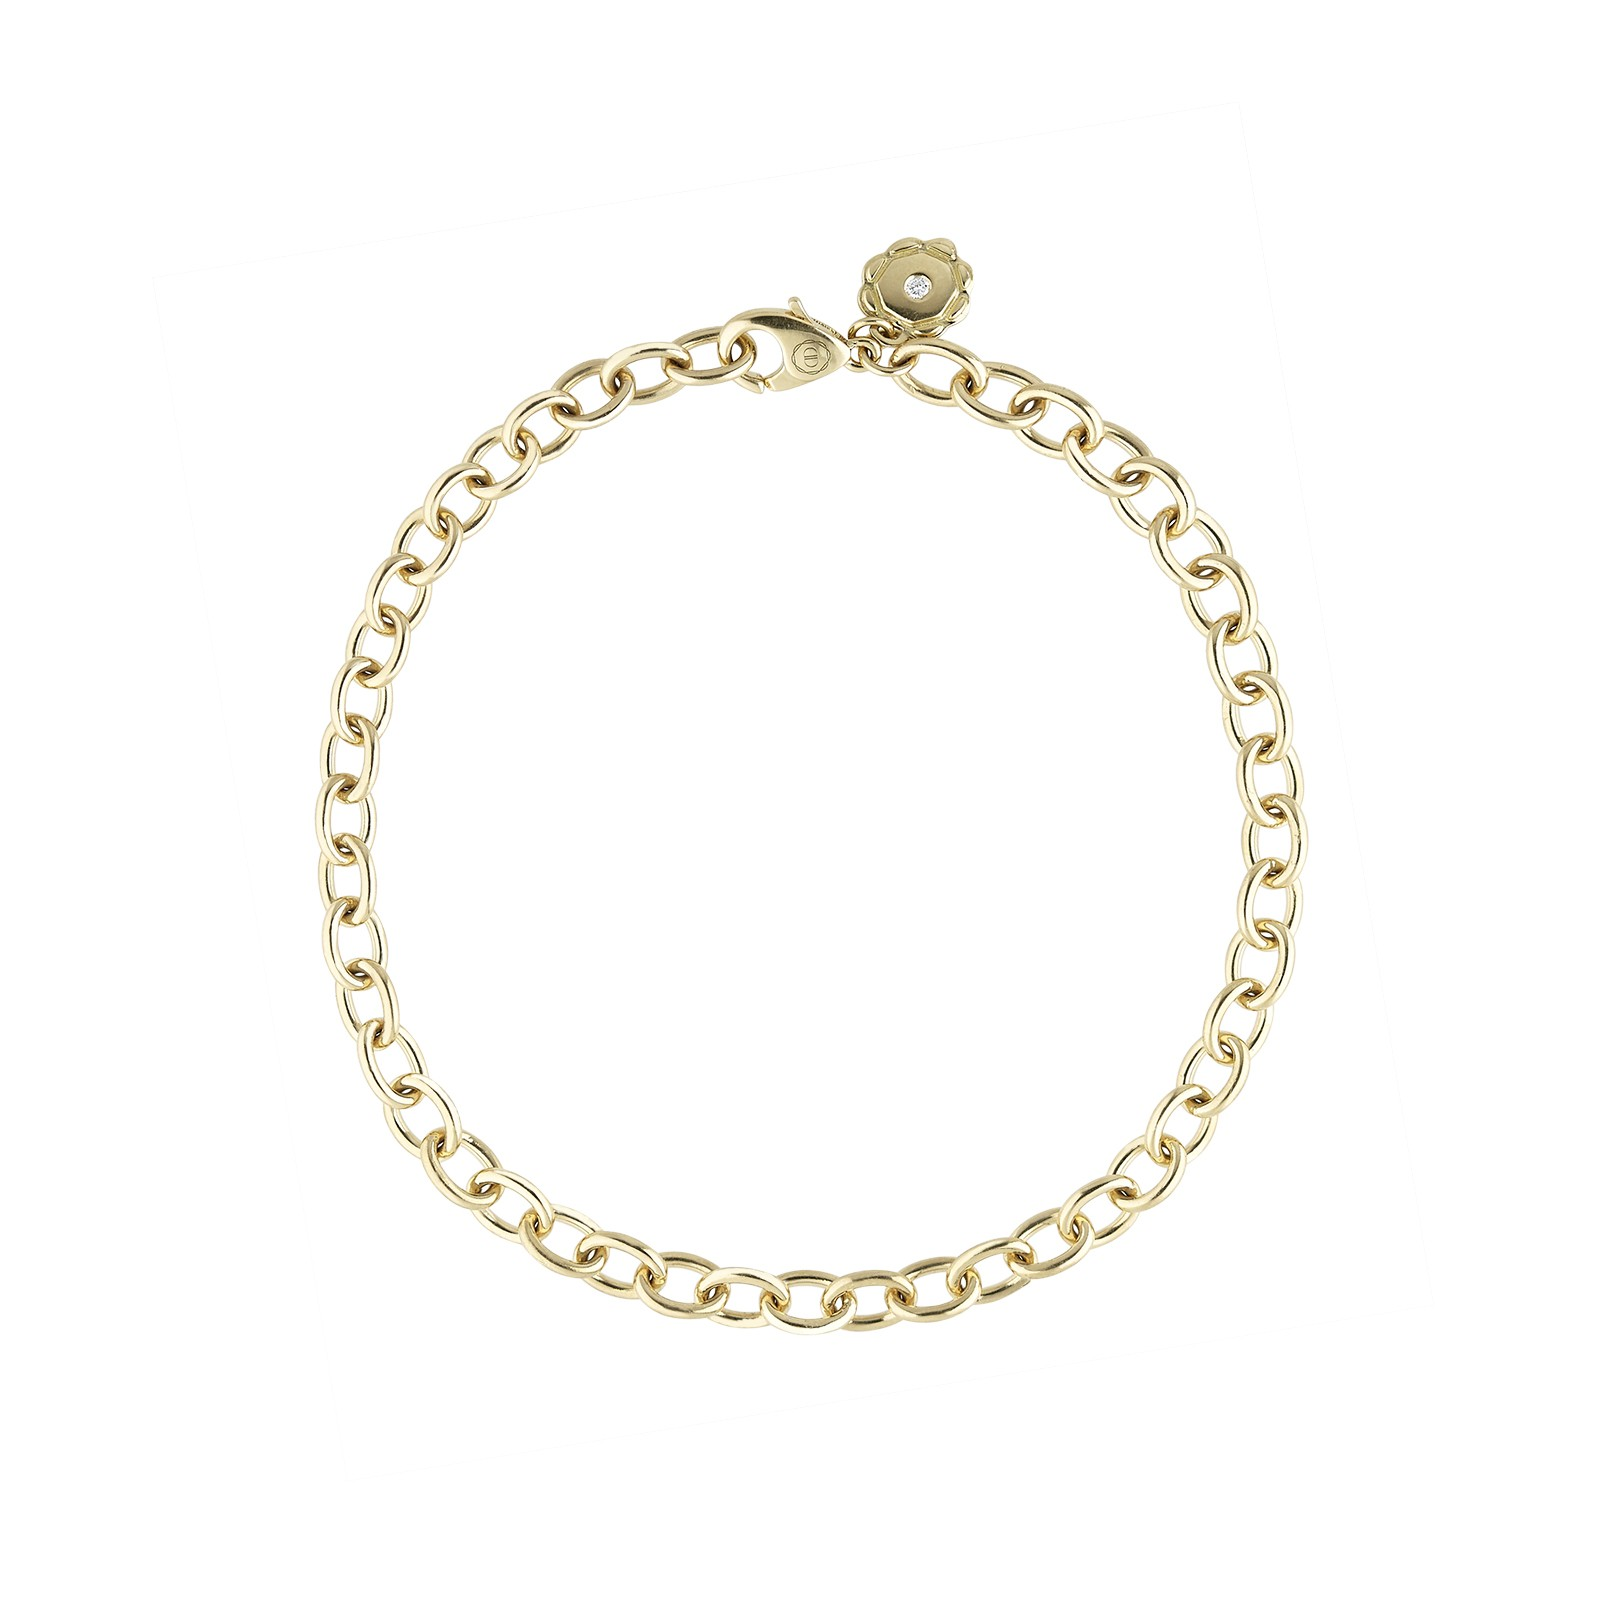 AIDIA Signature 7'' 18K Yellow Gold Charm Bracelet